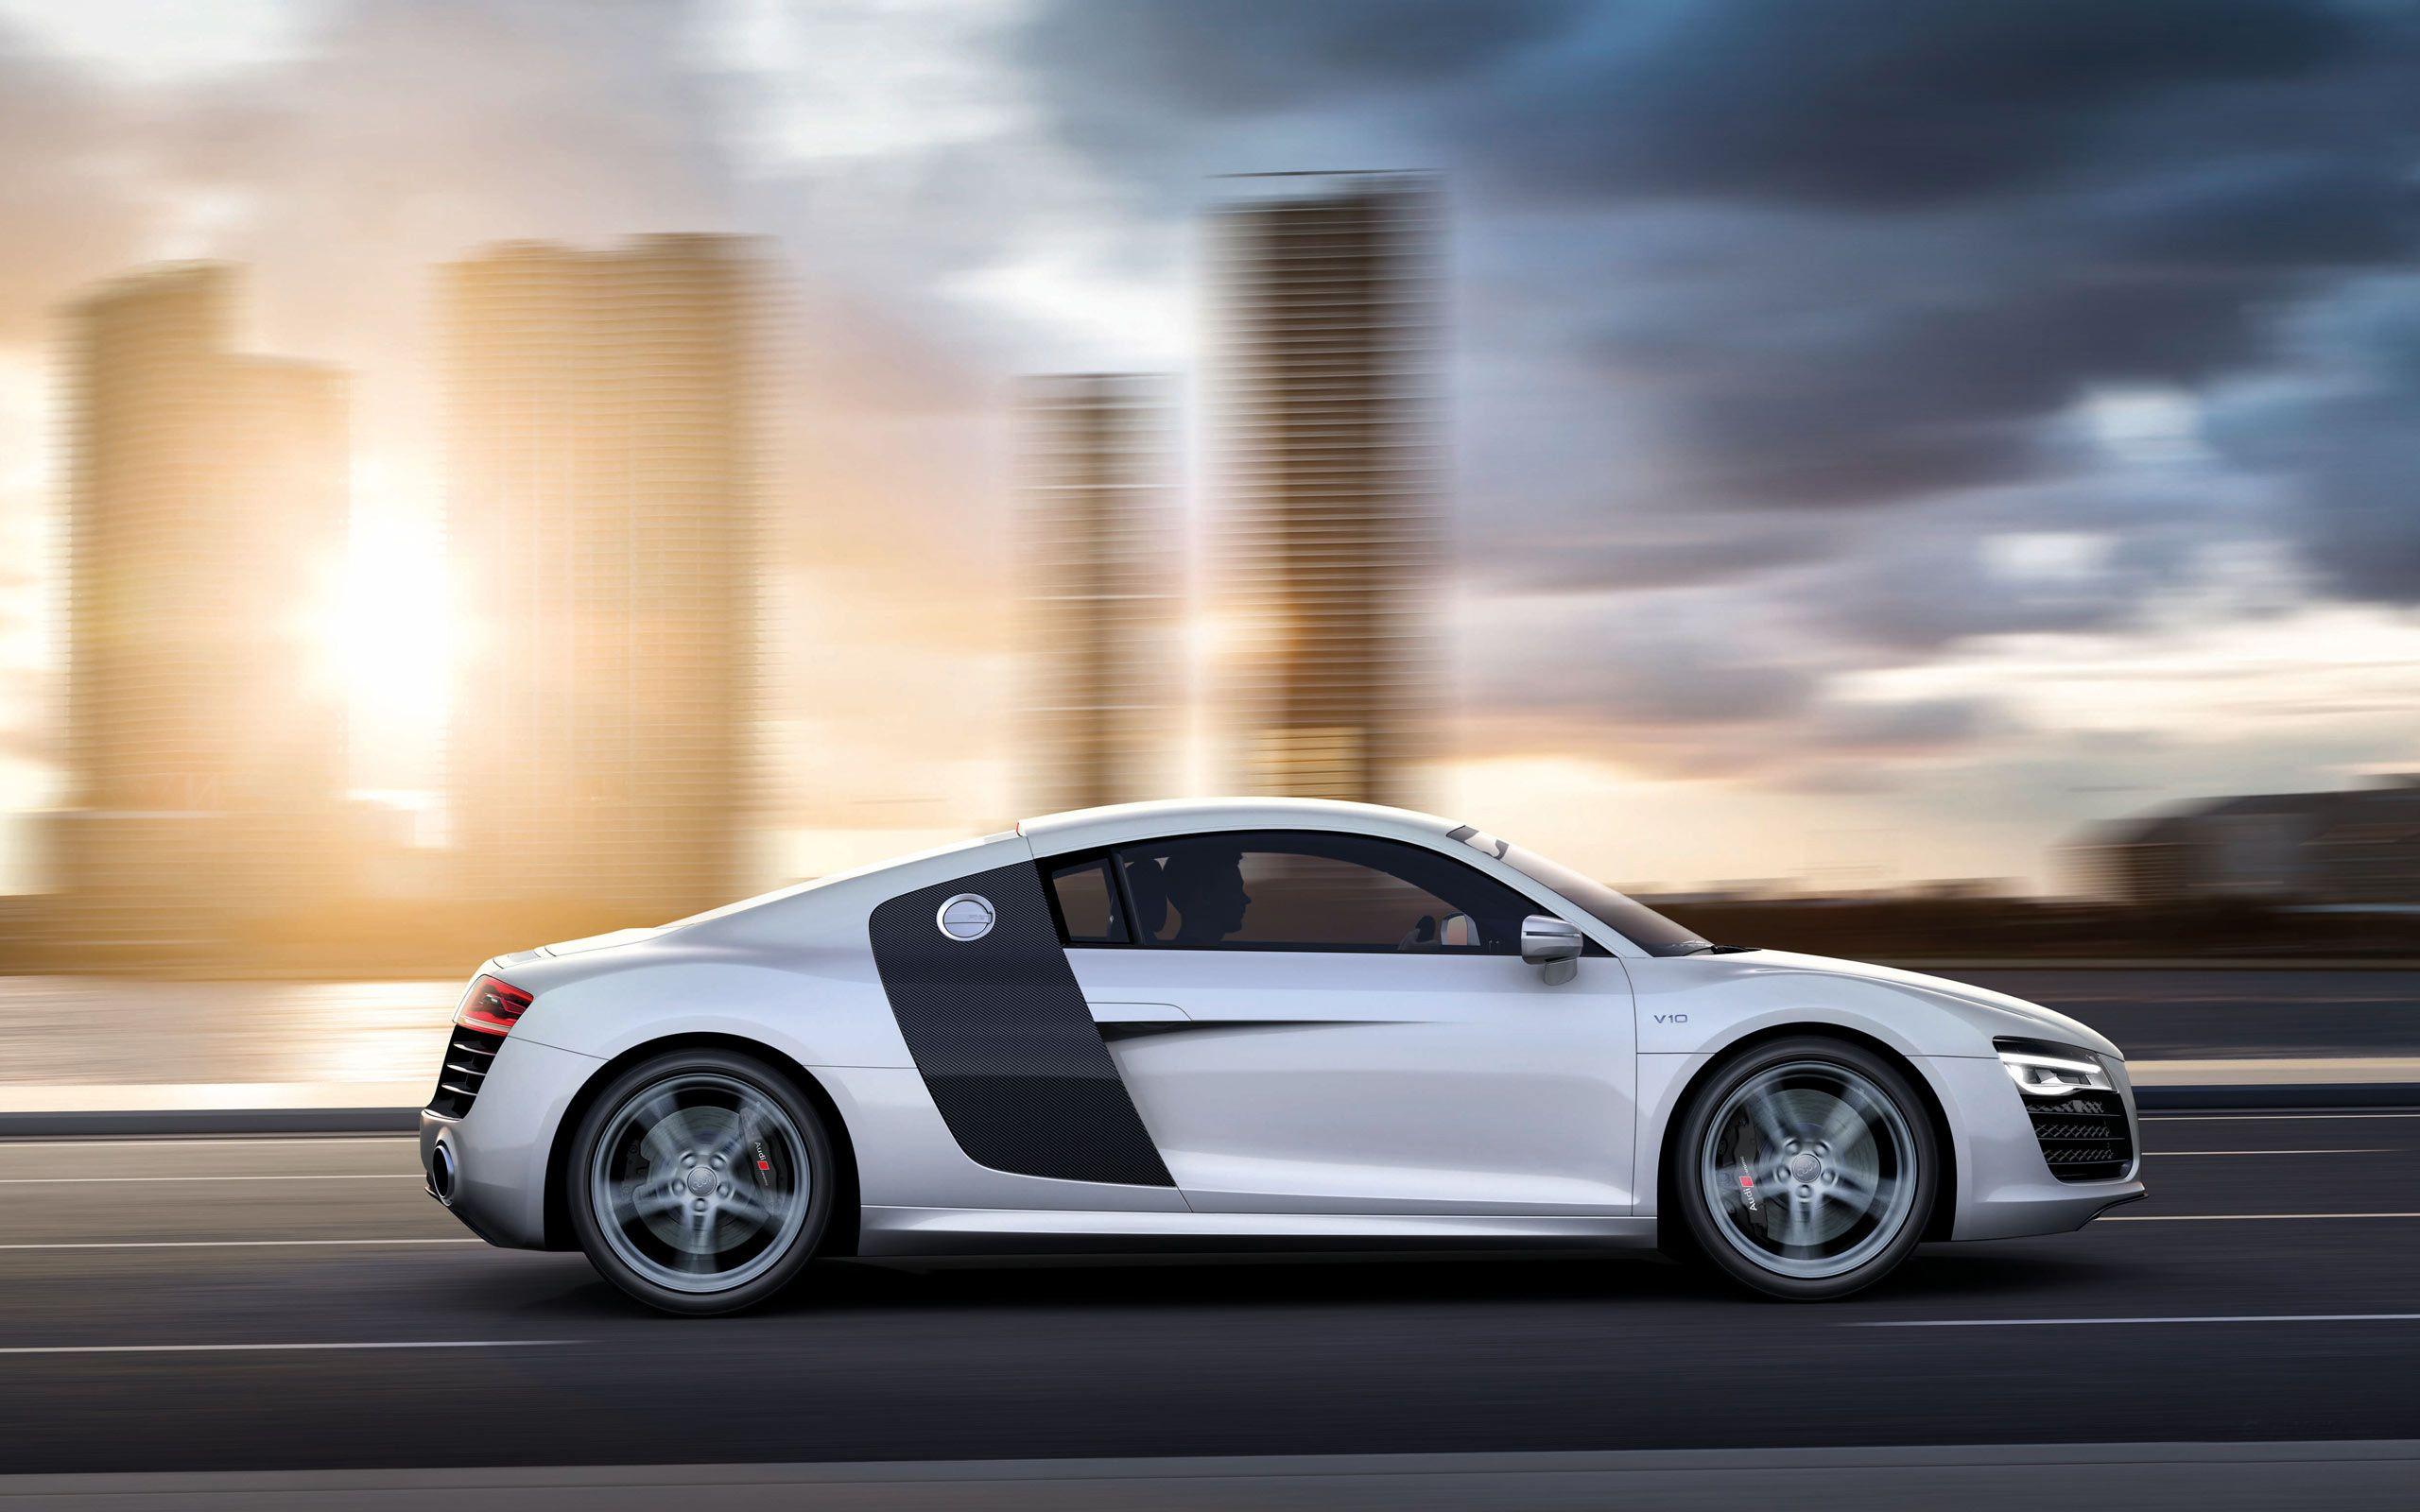 Audi R8 Wallpaper Automotive Design And Latest Car Models Audi R8 V10 Audi Cars Audi R8